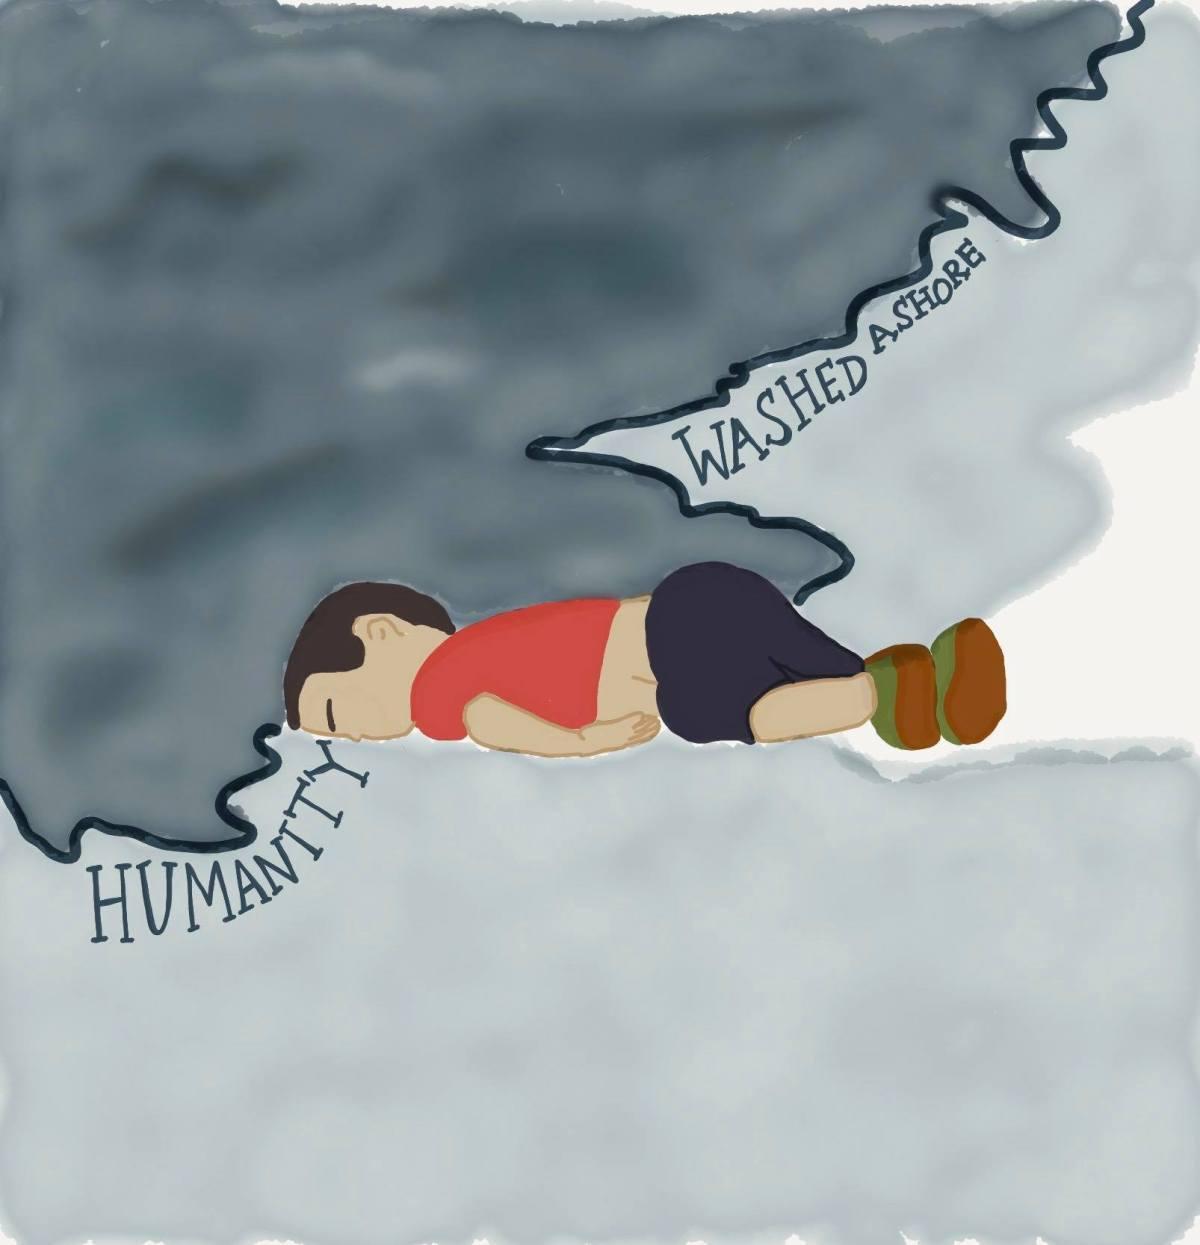 Humanity washed ashore.